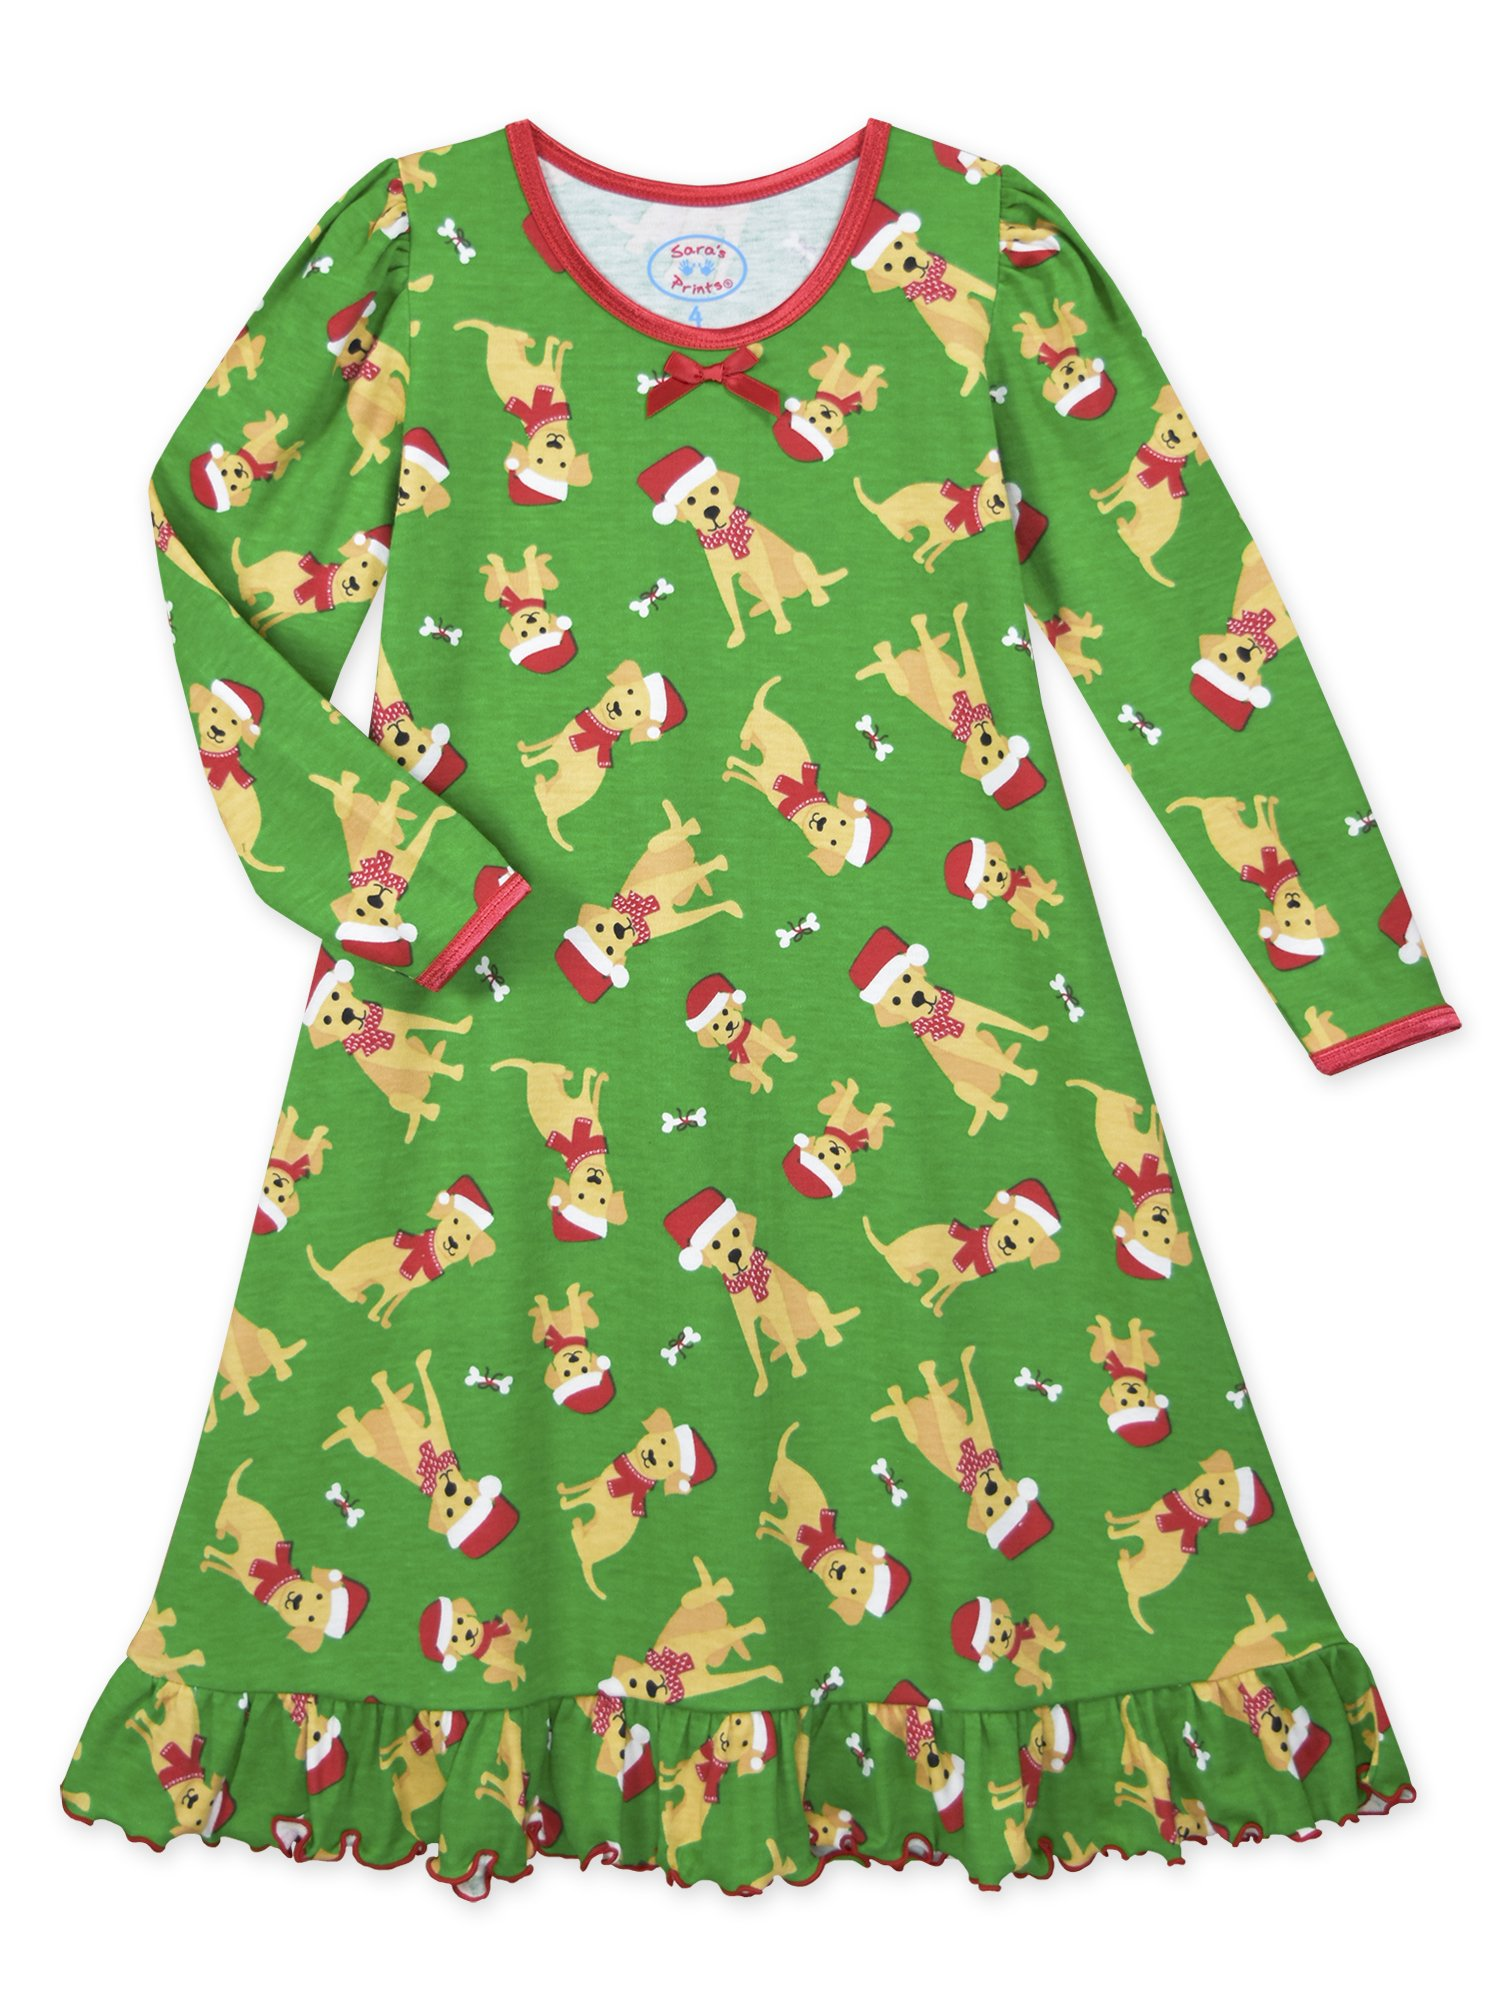 ea80b55edb Galleon - Sara s Prints Girls  Big Whirl And Twirl Long Sleeve Nightgown